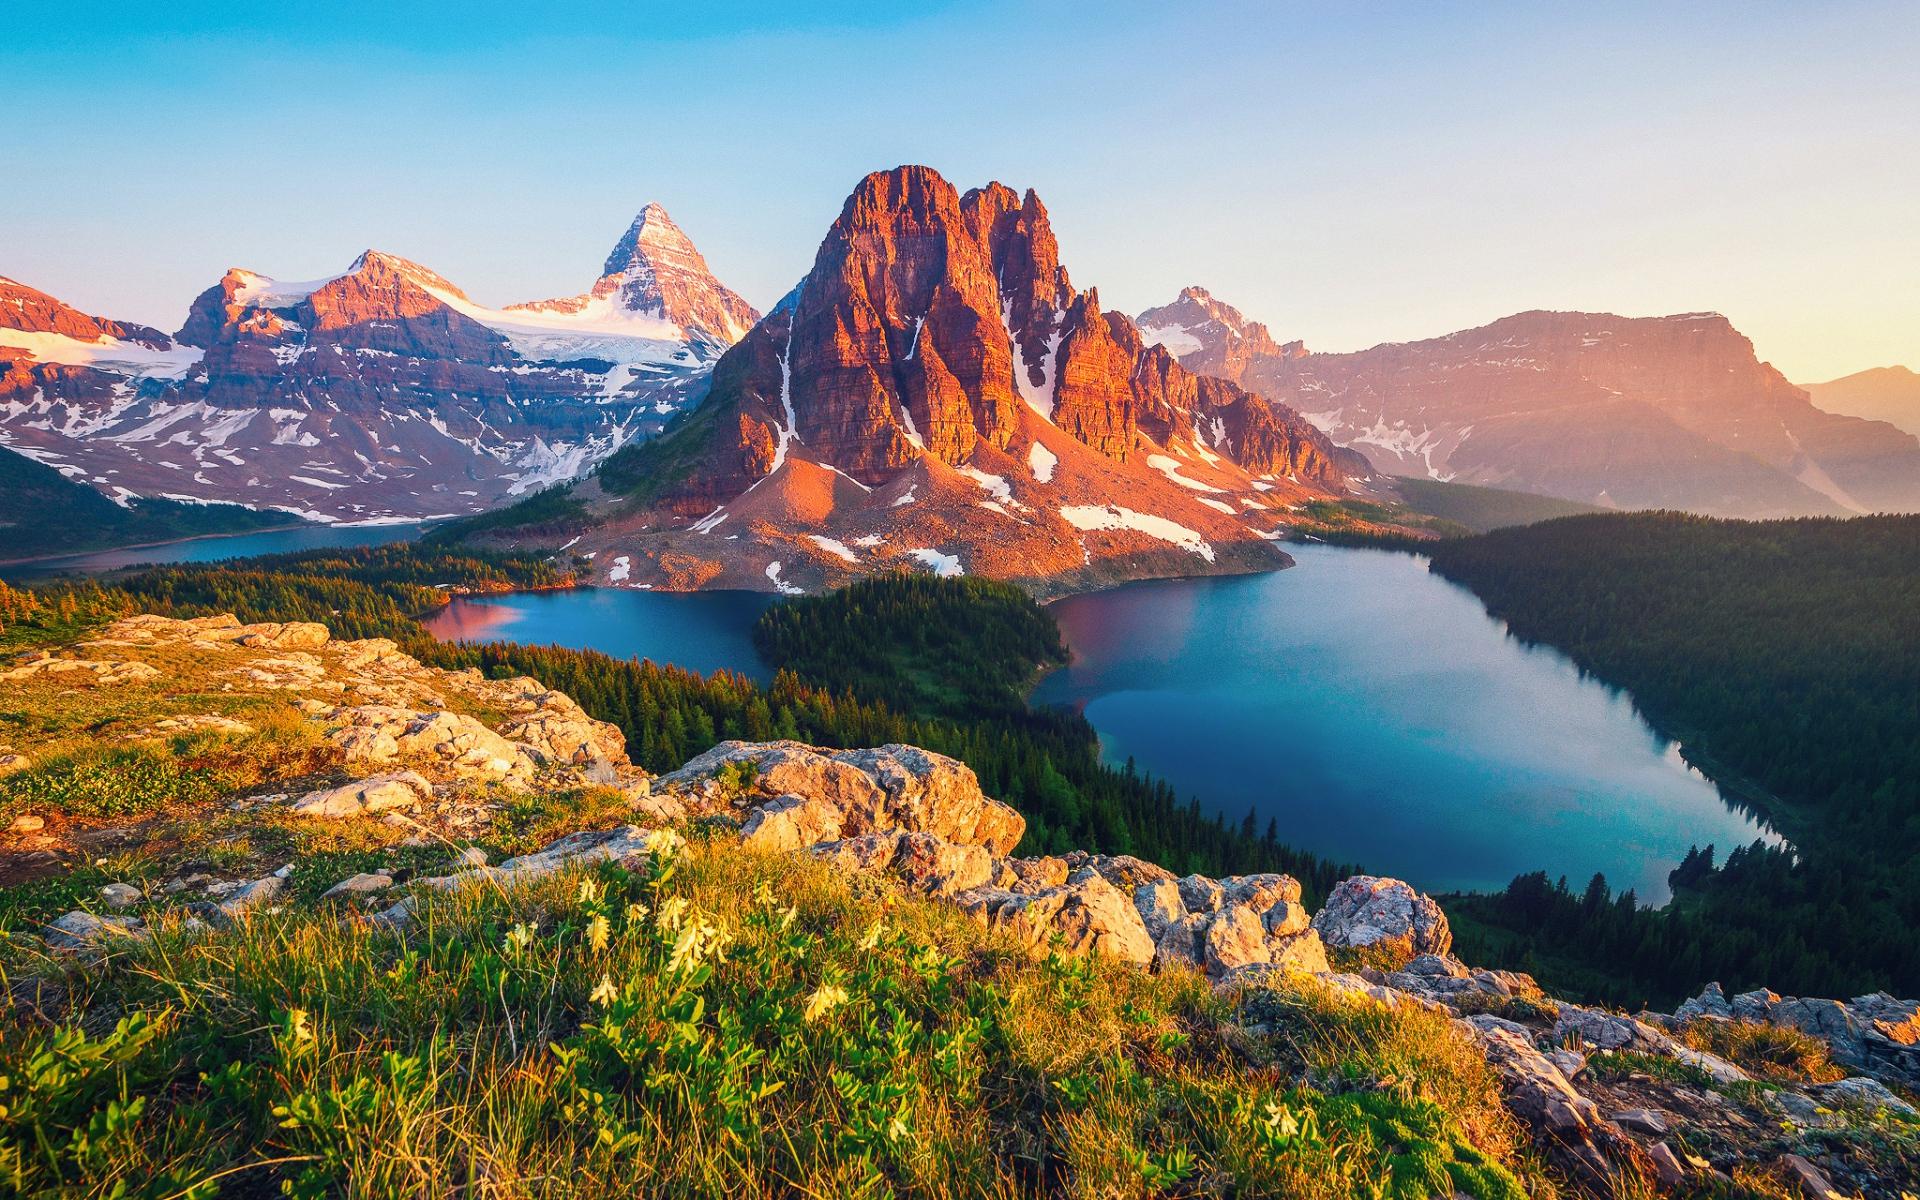 Картинки Канада, Британская Колумбия, гора, озеро фото и обои на рабочий стол